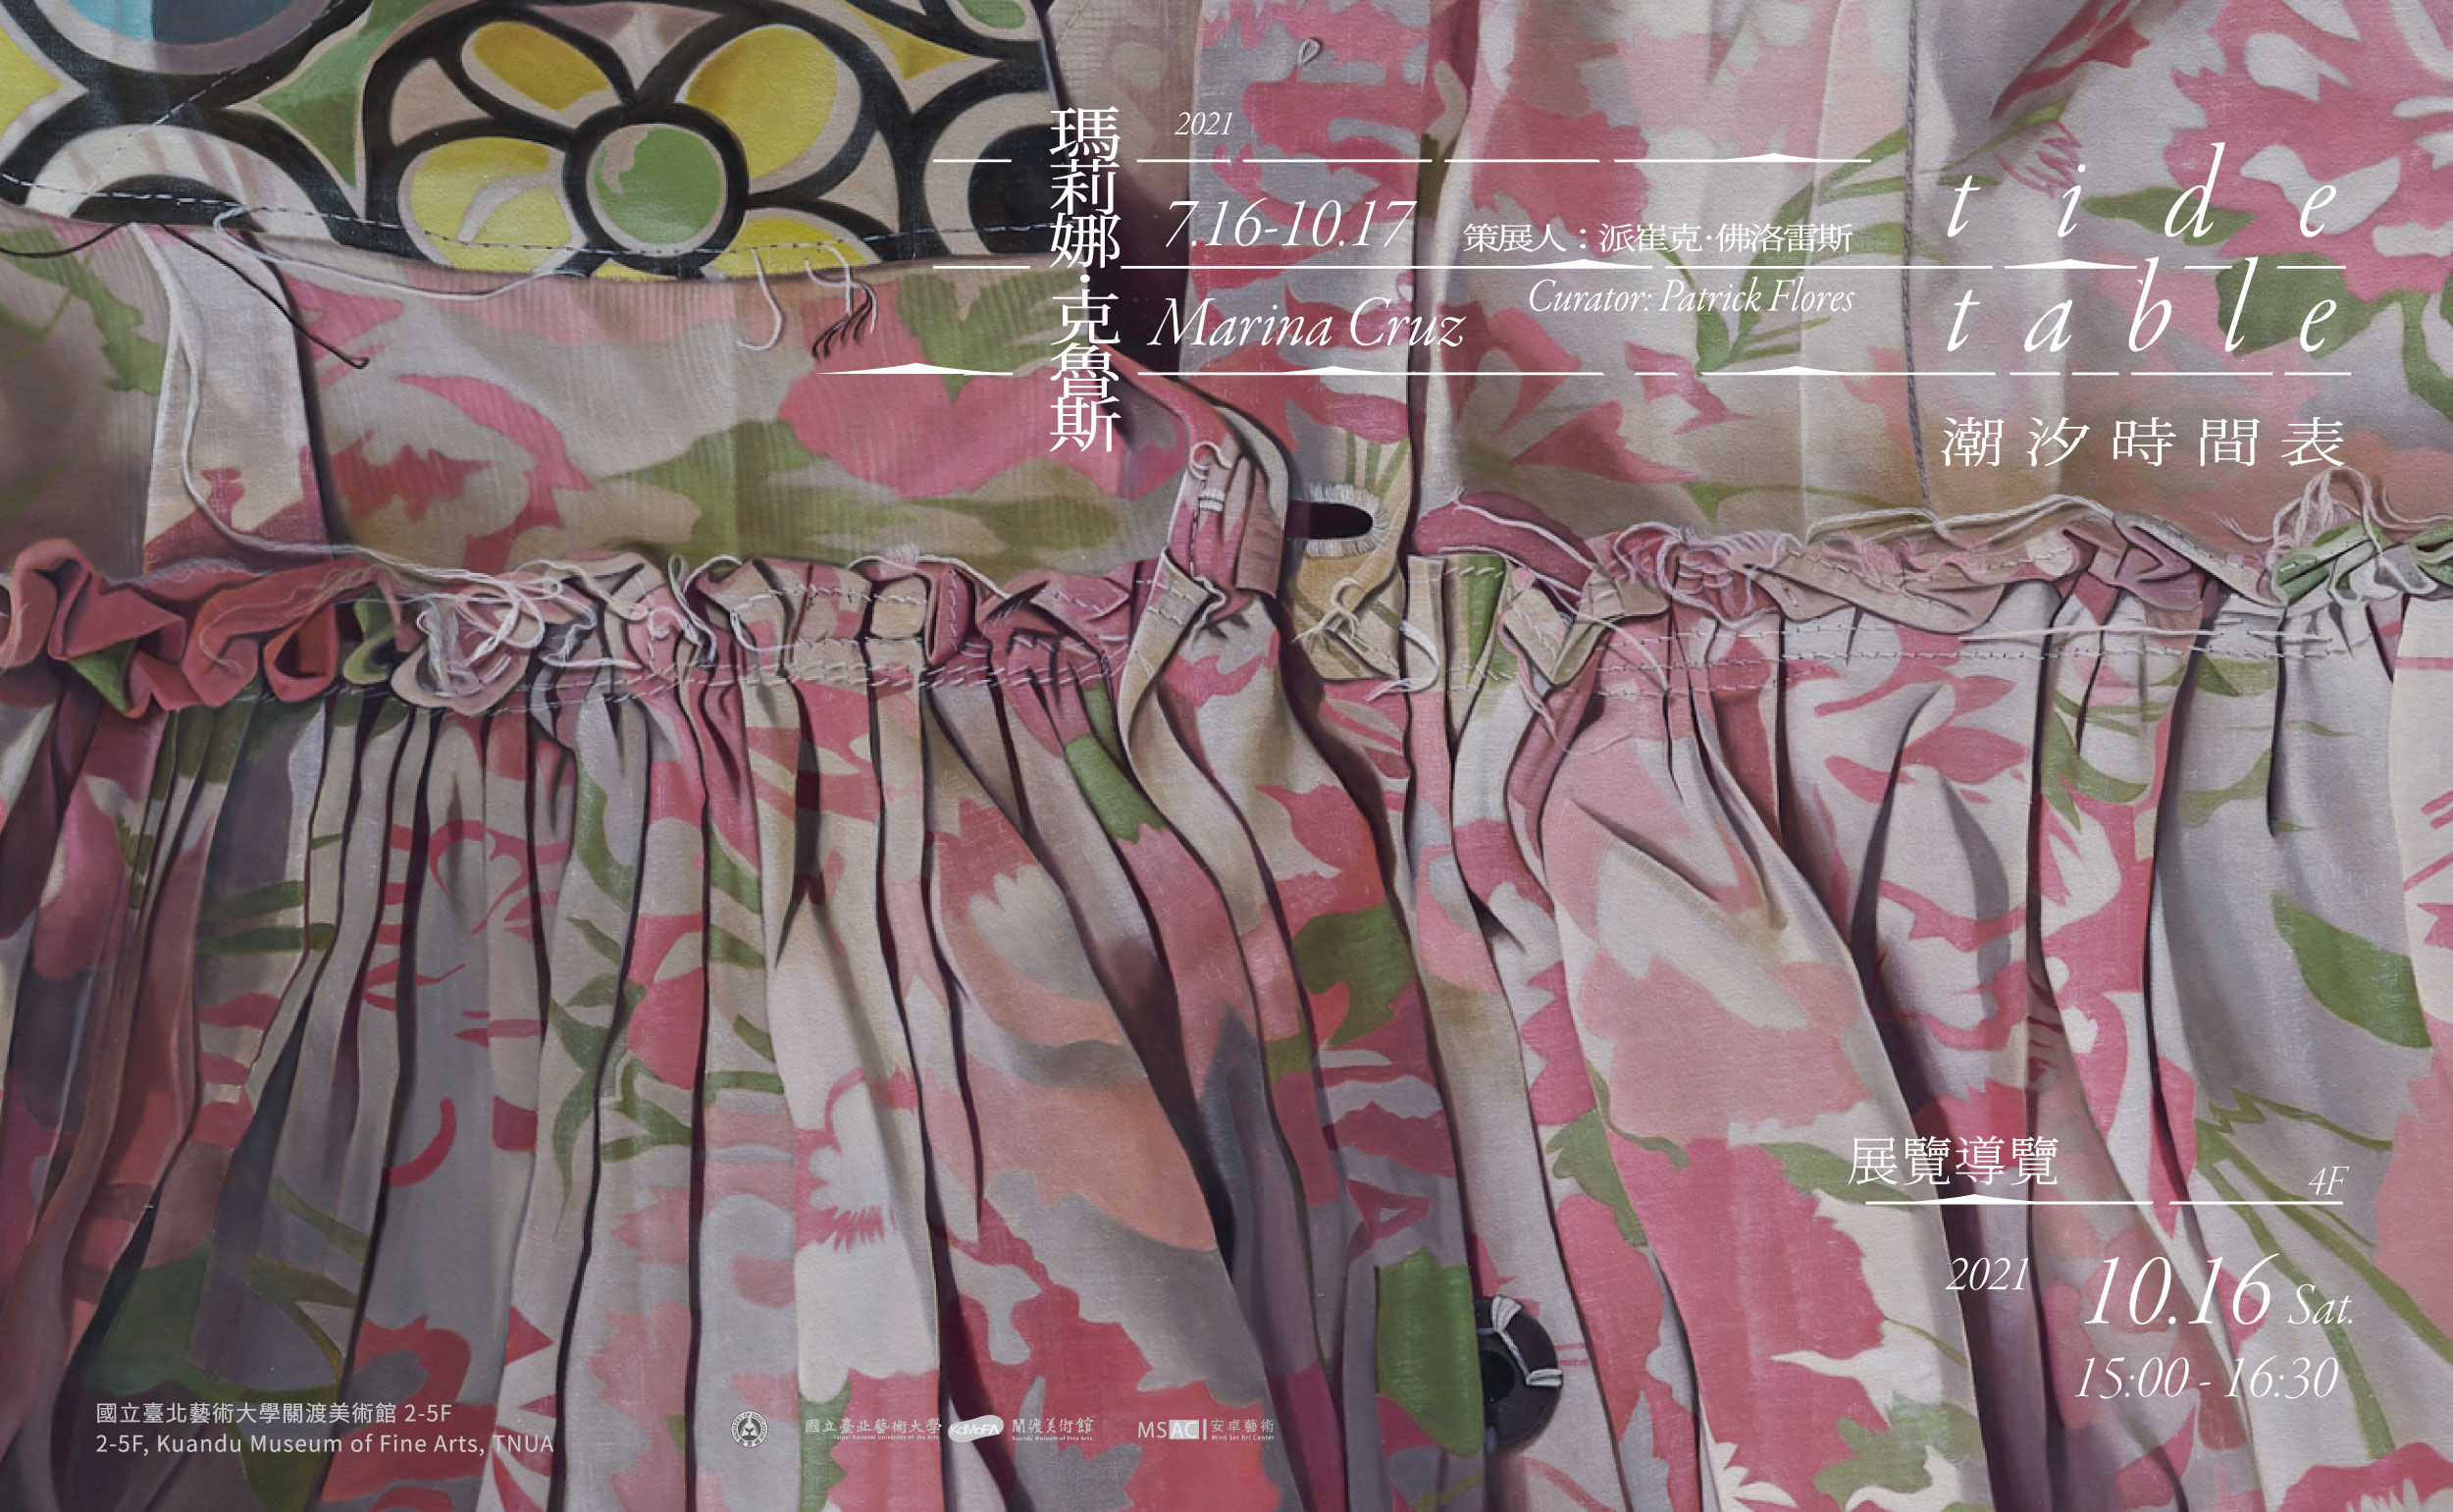 Tide Table: Marina Cruz- Exhibition Tour